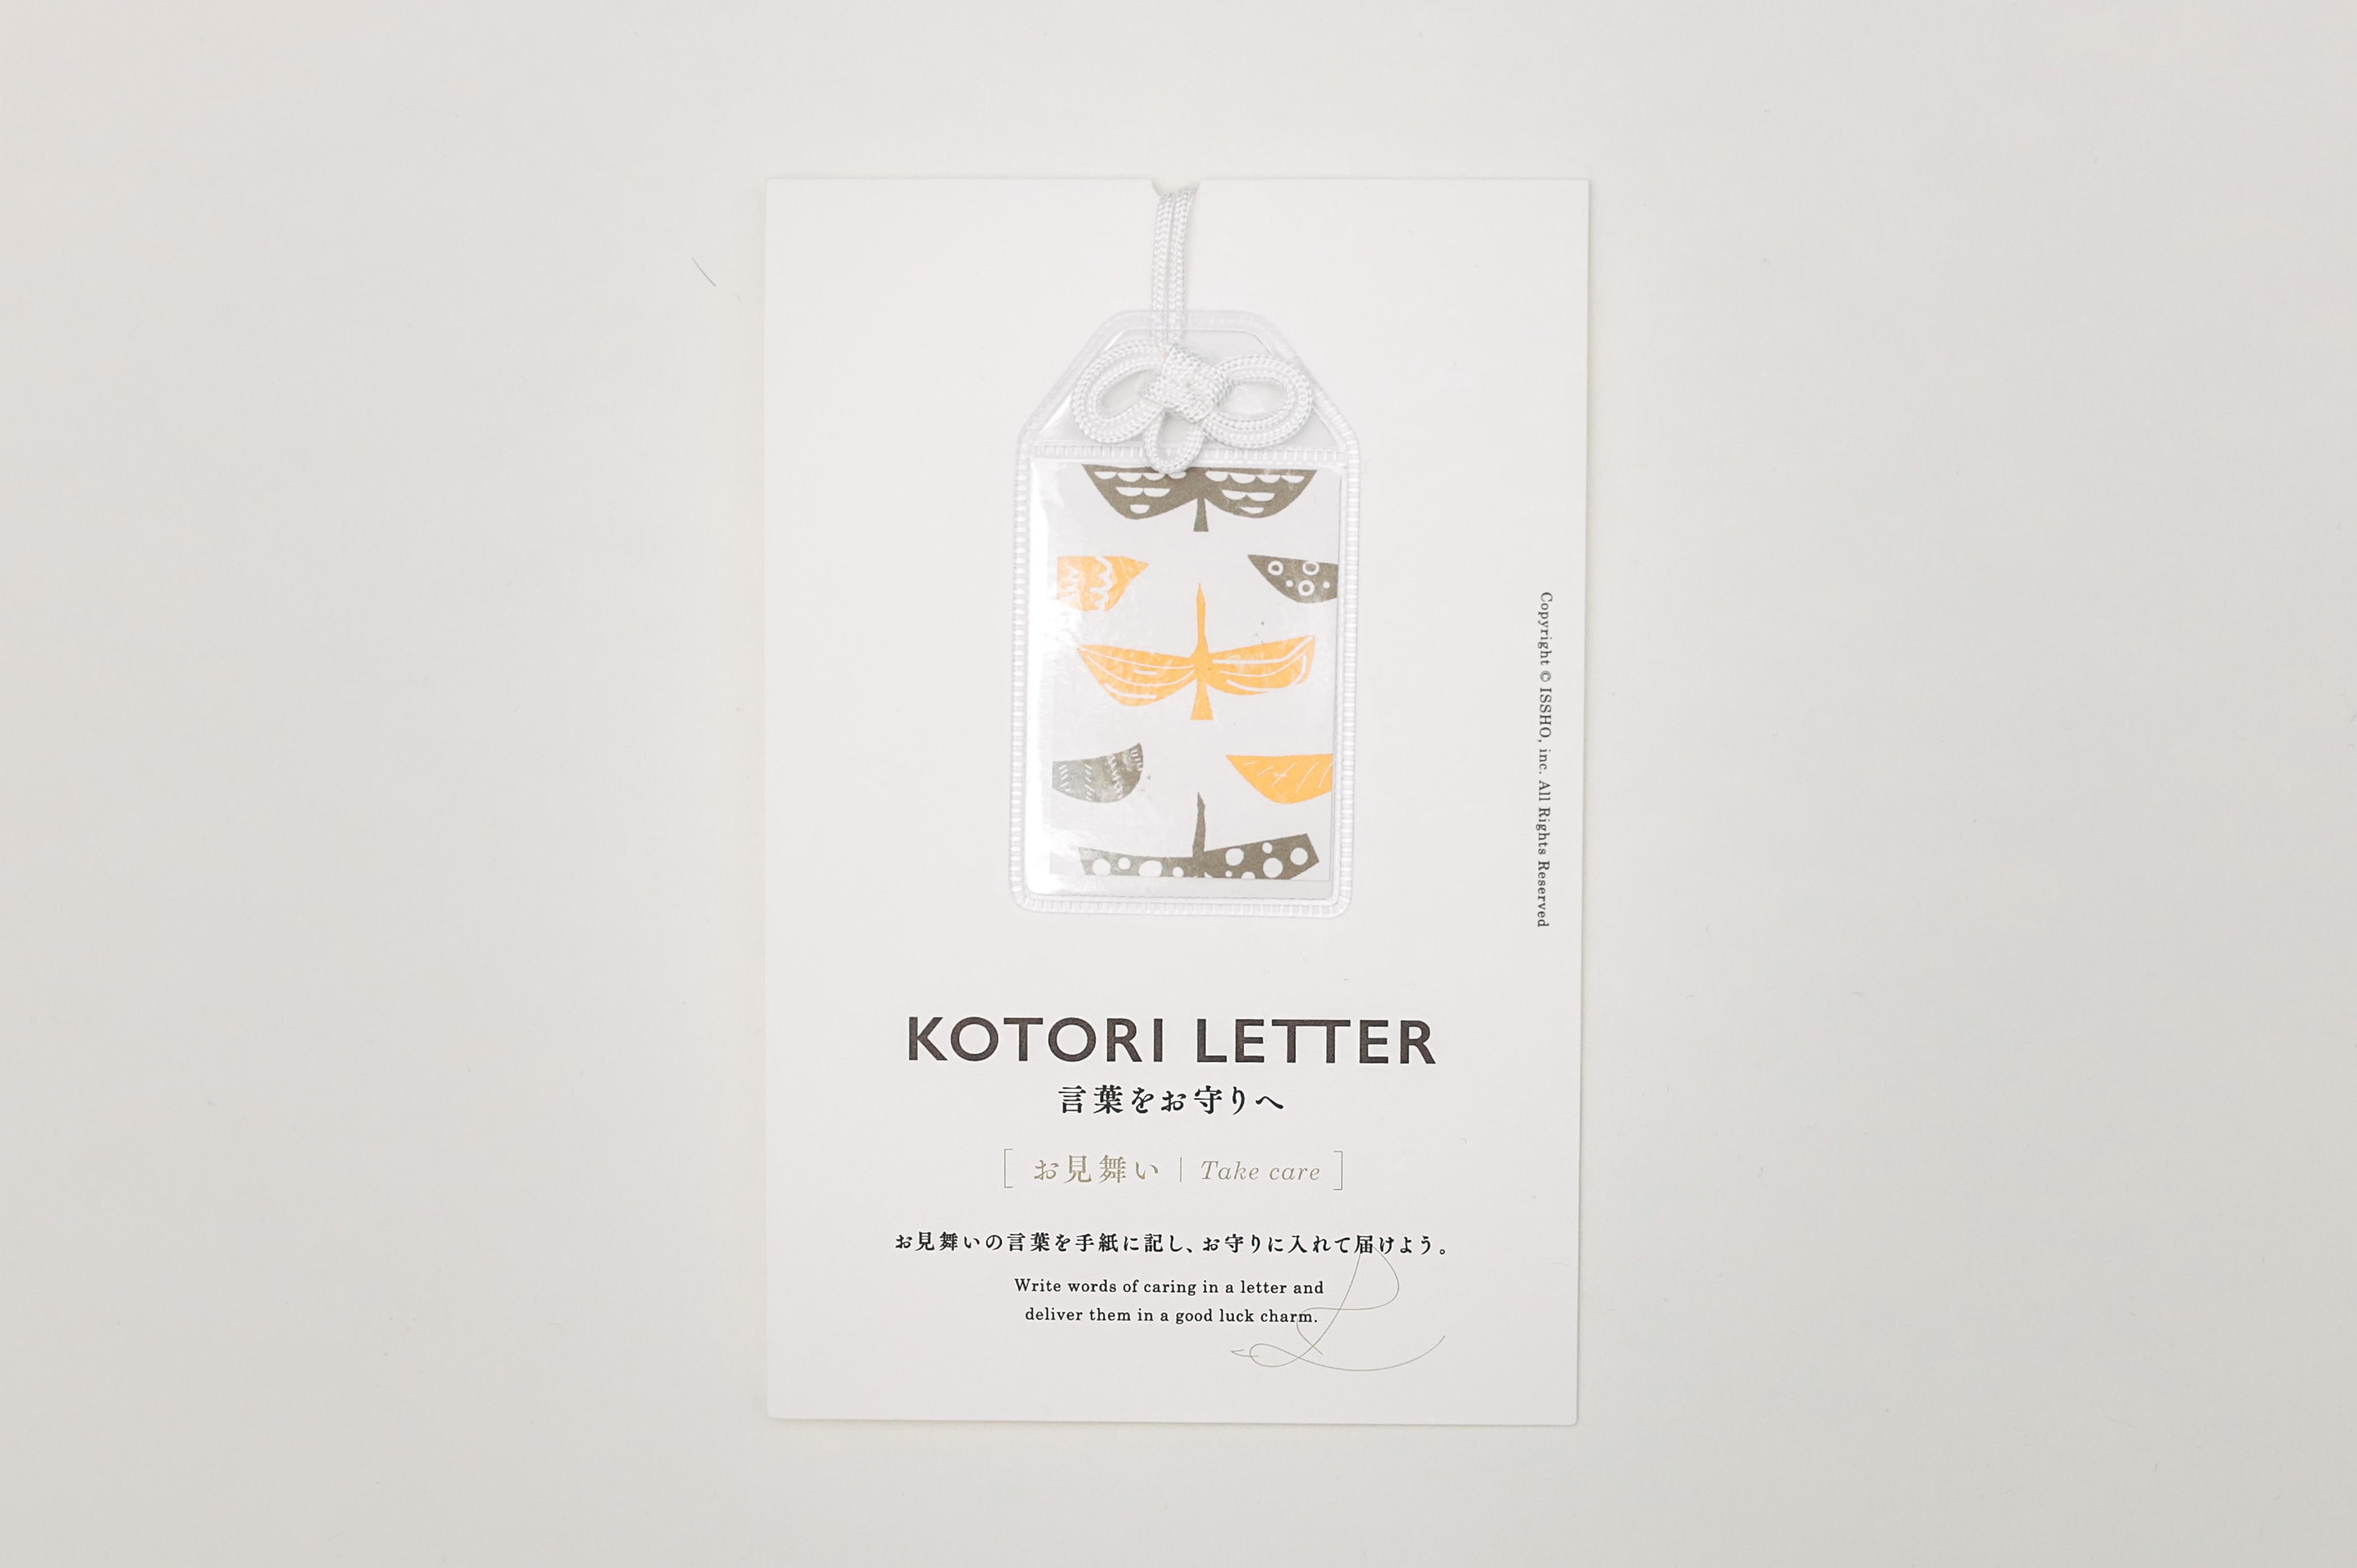 KOTORI LETTER | お見舞い | Take care | 鶴 |  Crane